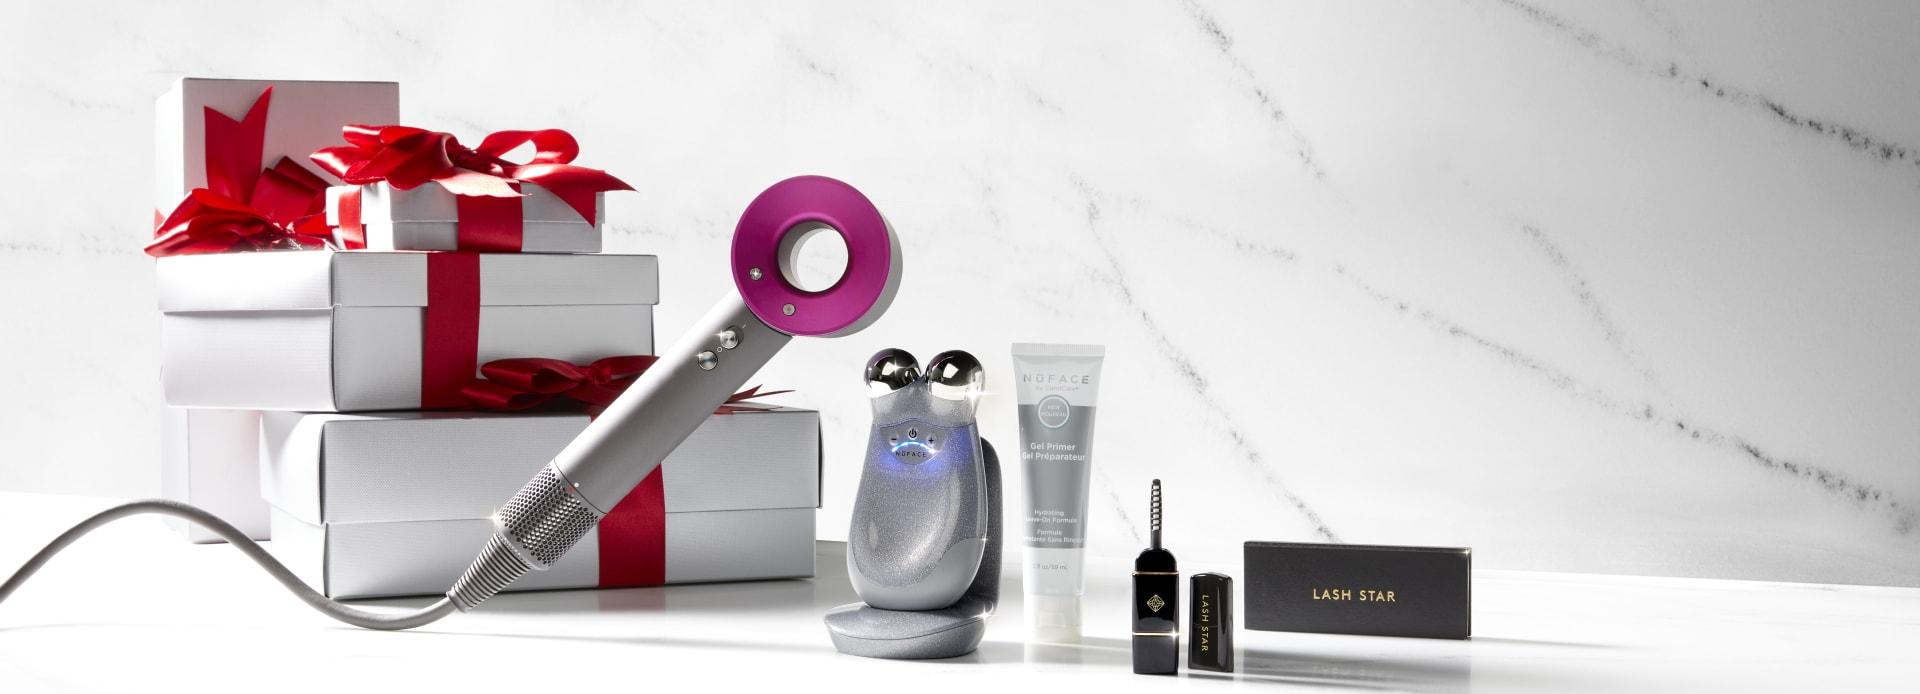 Supersonic Hair Dryer|HEATED LASH STYLER|PLATINUM TRINITY SET